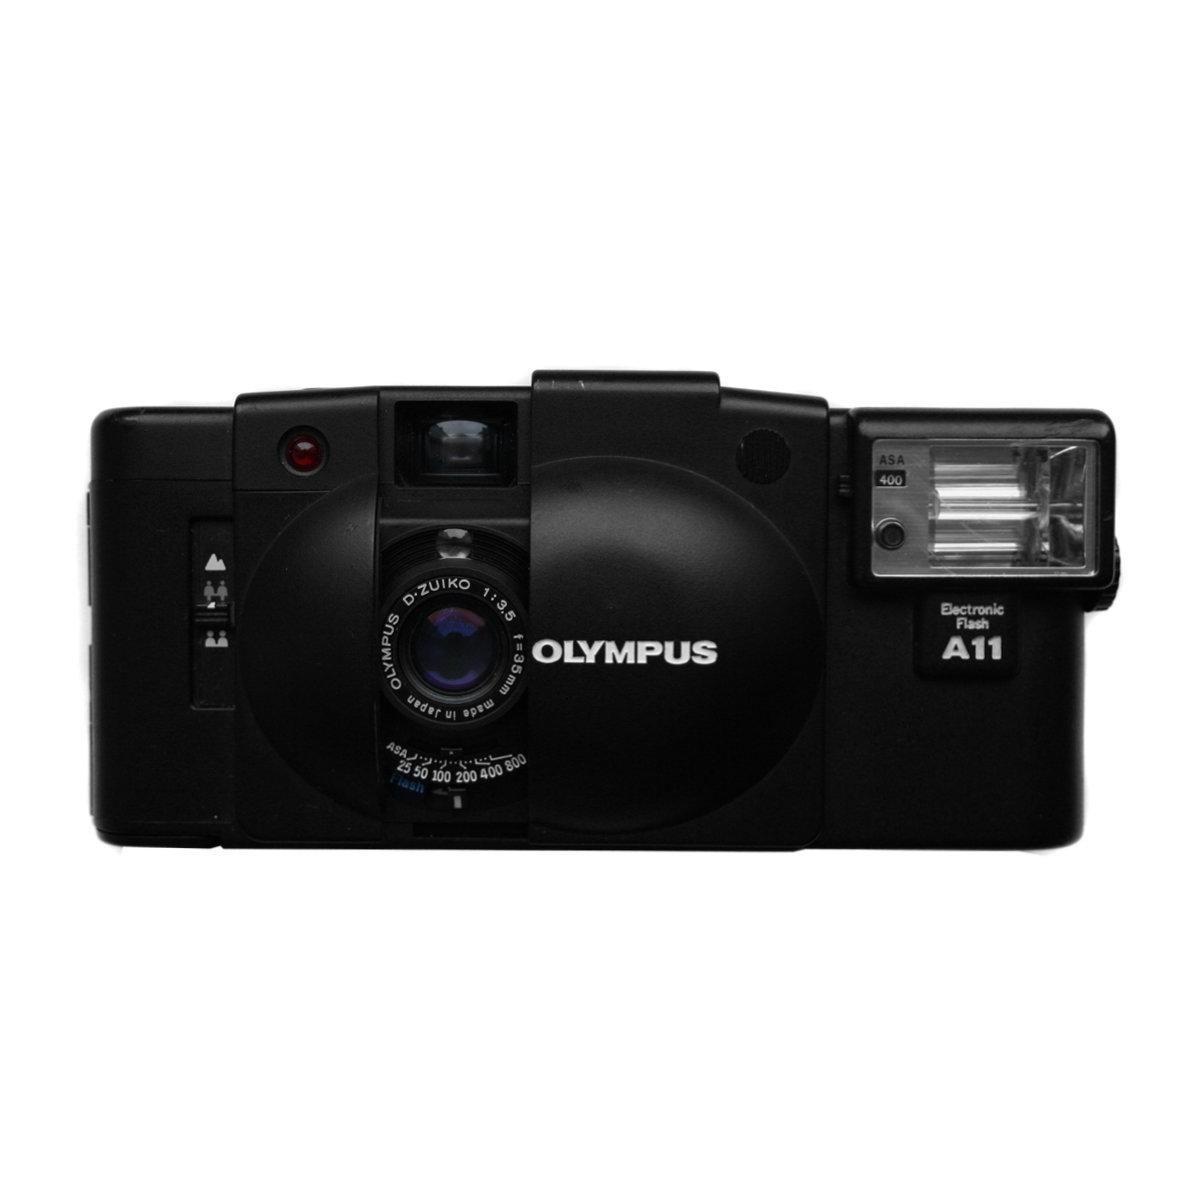 Olympus XA2 + Flash A11